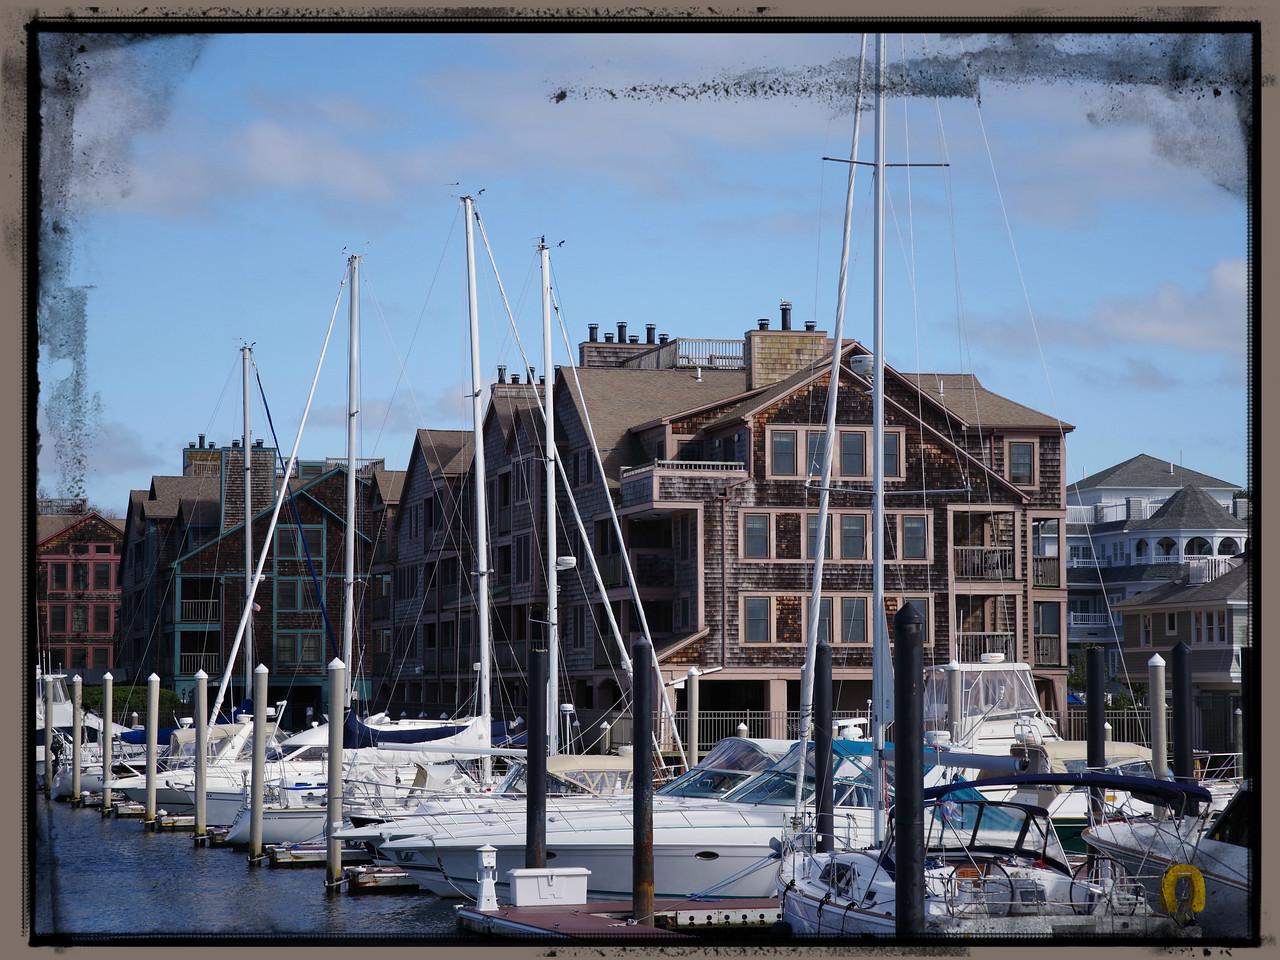 Newport -  Wyndham Onshore